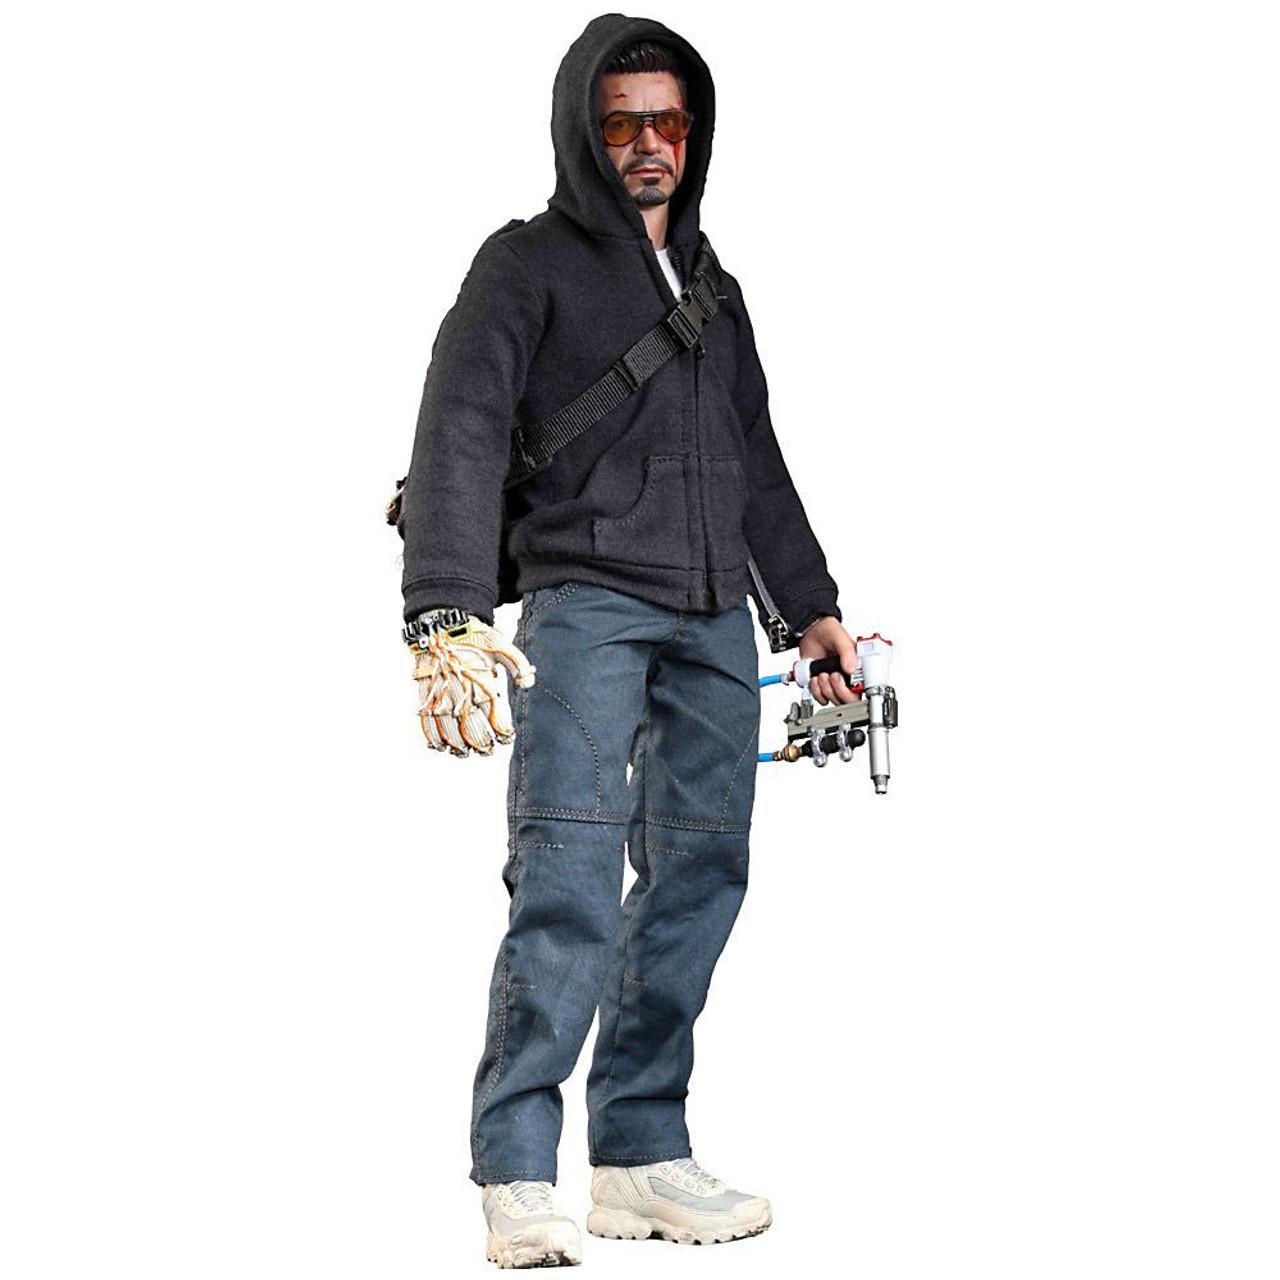 Iron Man 3 Movie Masterpiece Tony Stark 1/6 Collectible Figure [The Mechanic]